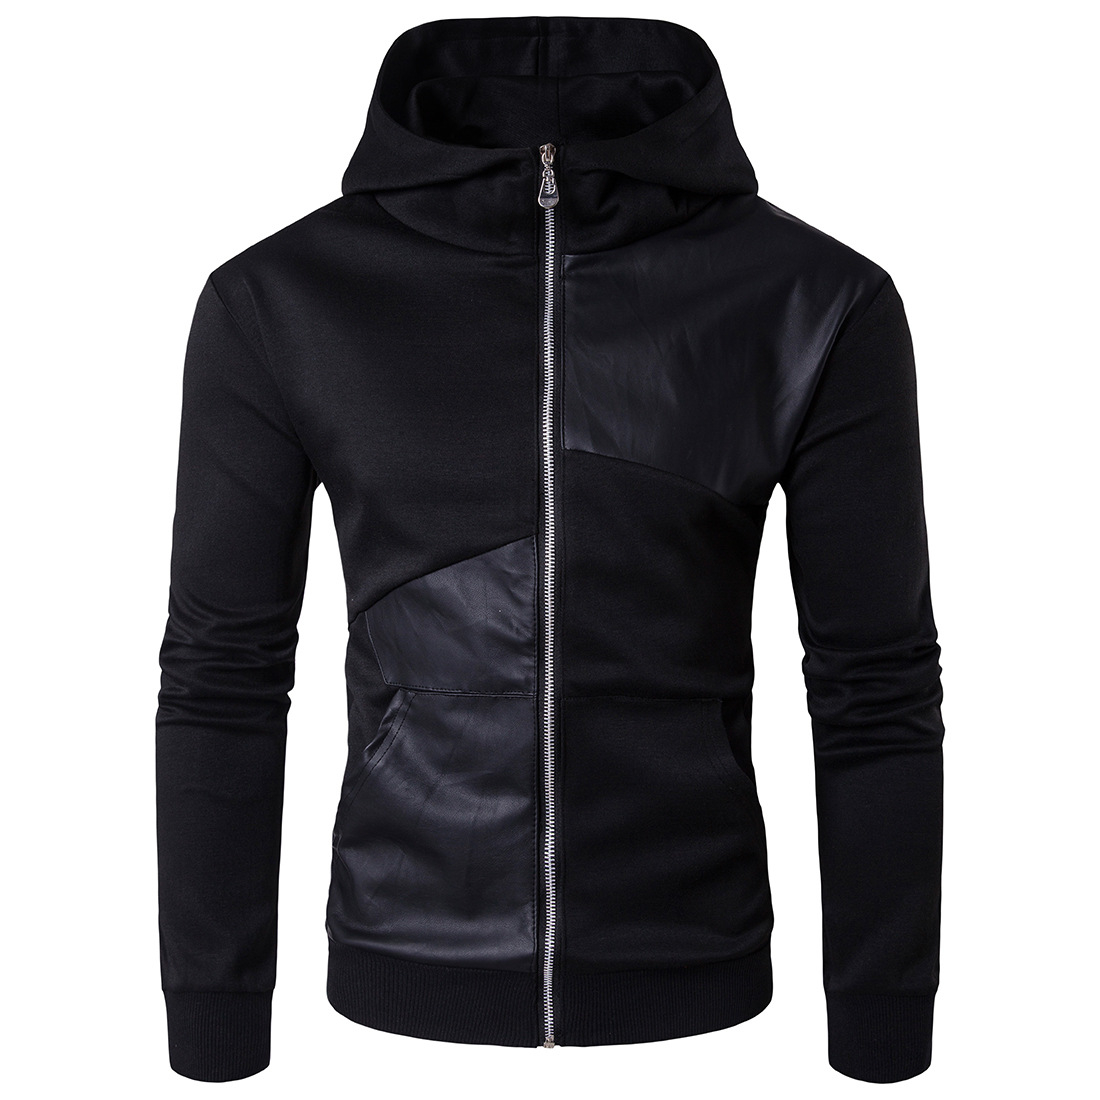 Spring and Autumn Men's Stand Collar British Sweatshirt Black Zipper Hoodie Sweatshirt SH190903